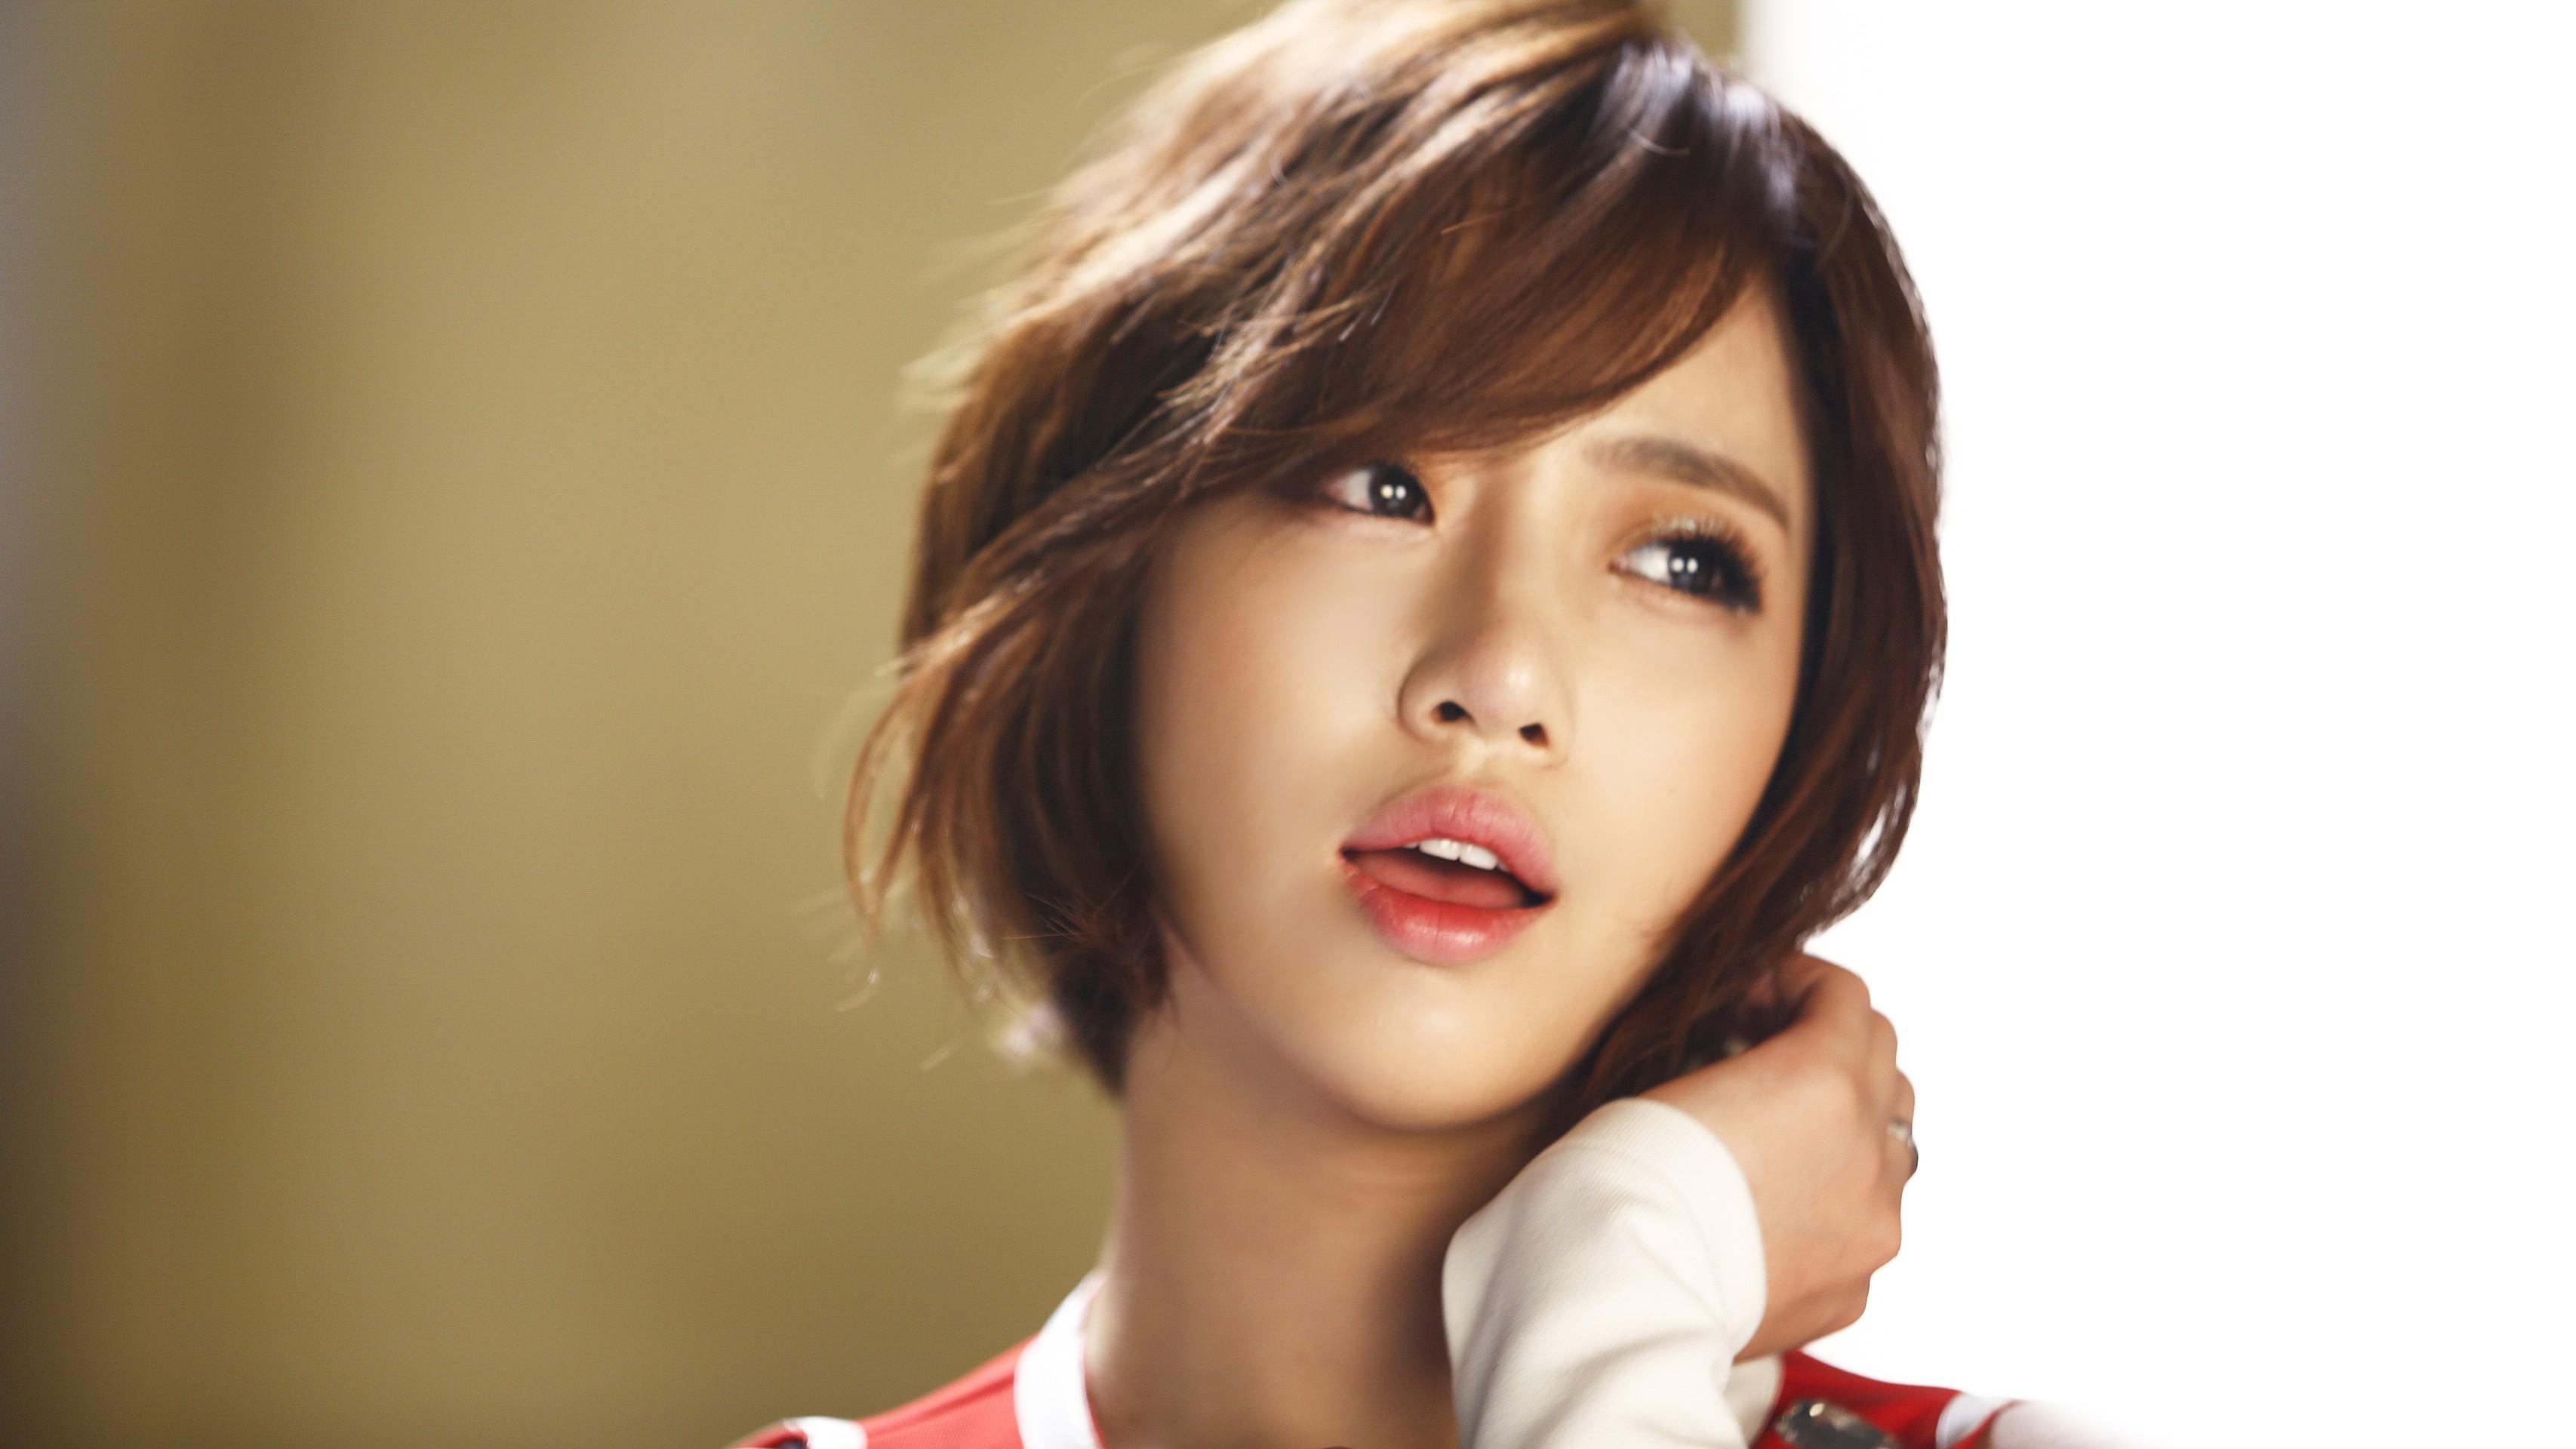 Корейские девушки милые фото